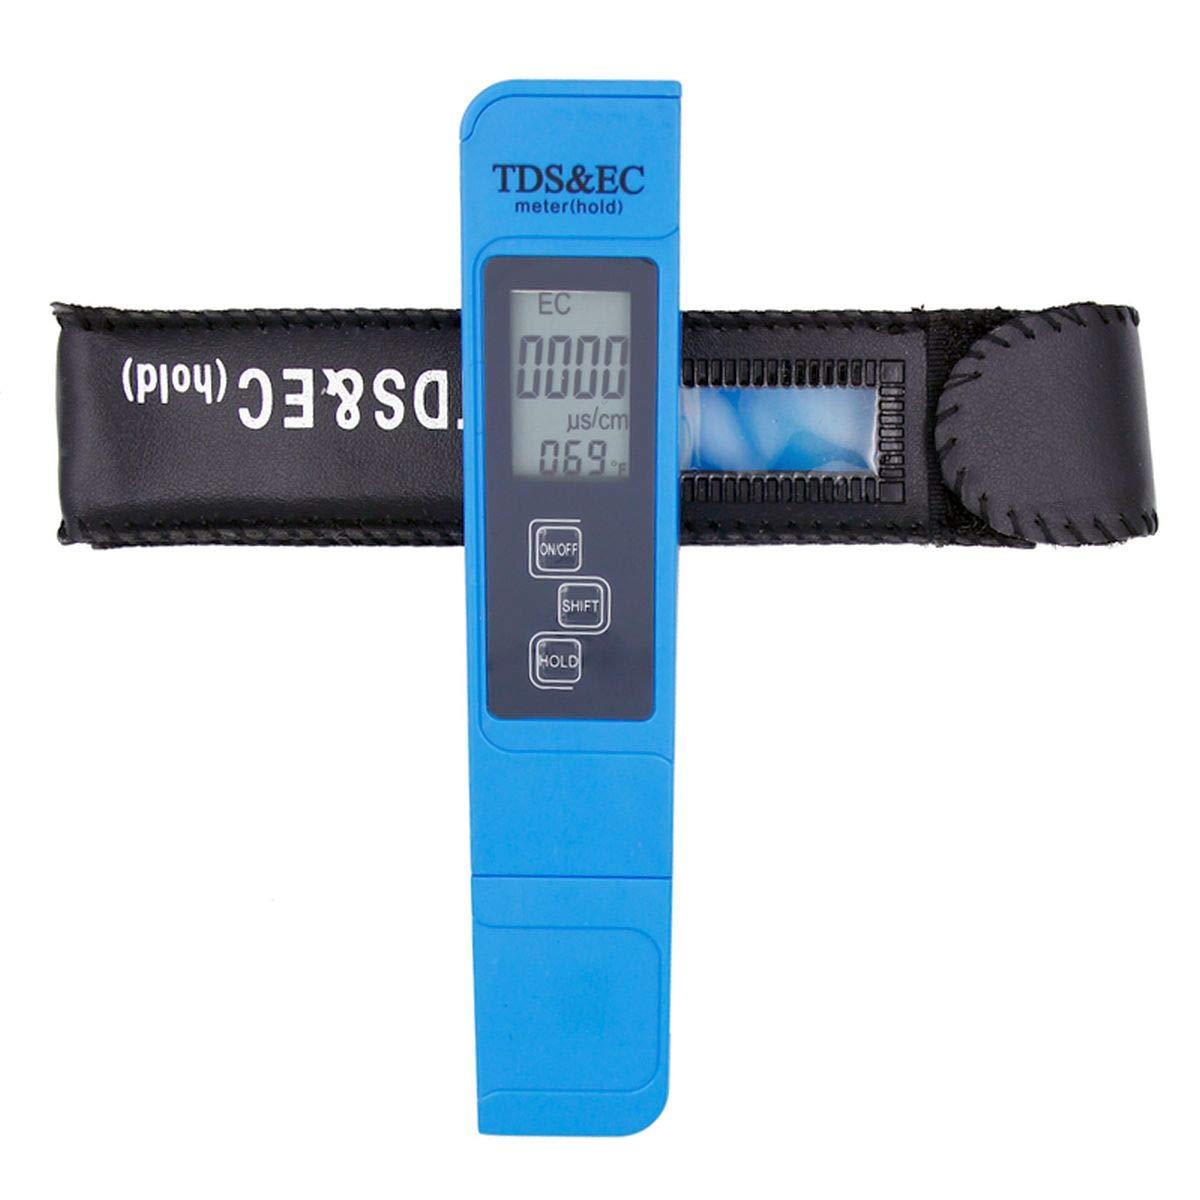 3 in 1 Temperature TDS EC Meter Pen Water Quality Tester Measurement EC&TDS Tester 0-9000 ppm for Nutrient Tester Measurement Range for Aquarium, Drinking, Pool and Aquarium Water